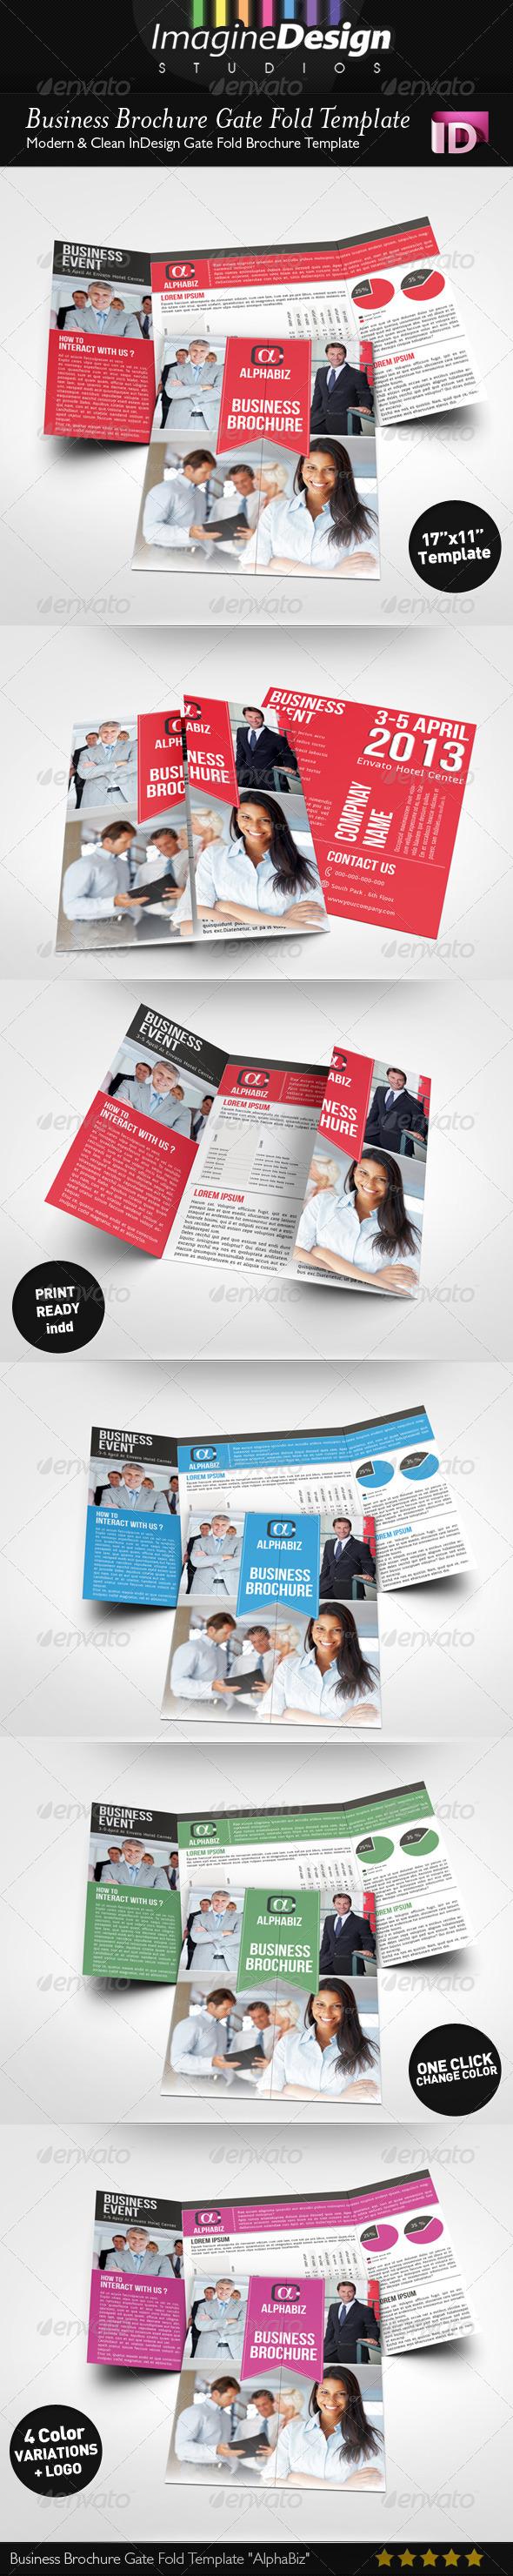 GraphicRiver Business Brochure Gate Fold Template AlphaBiz 4096950